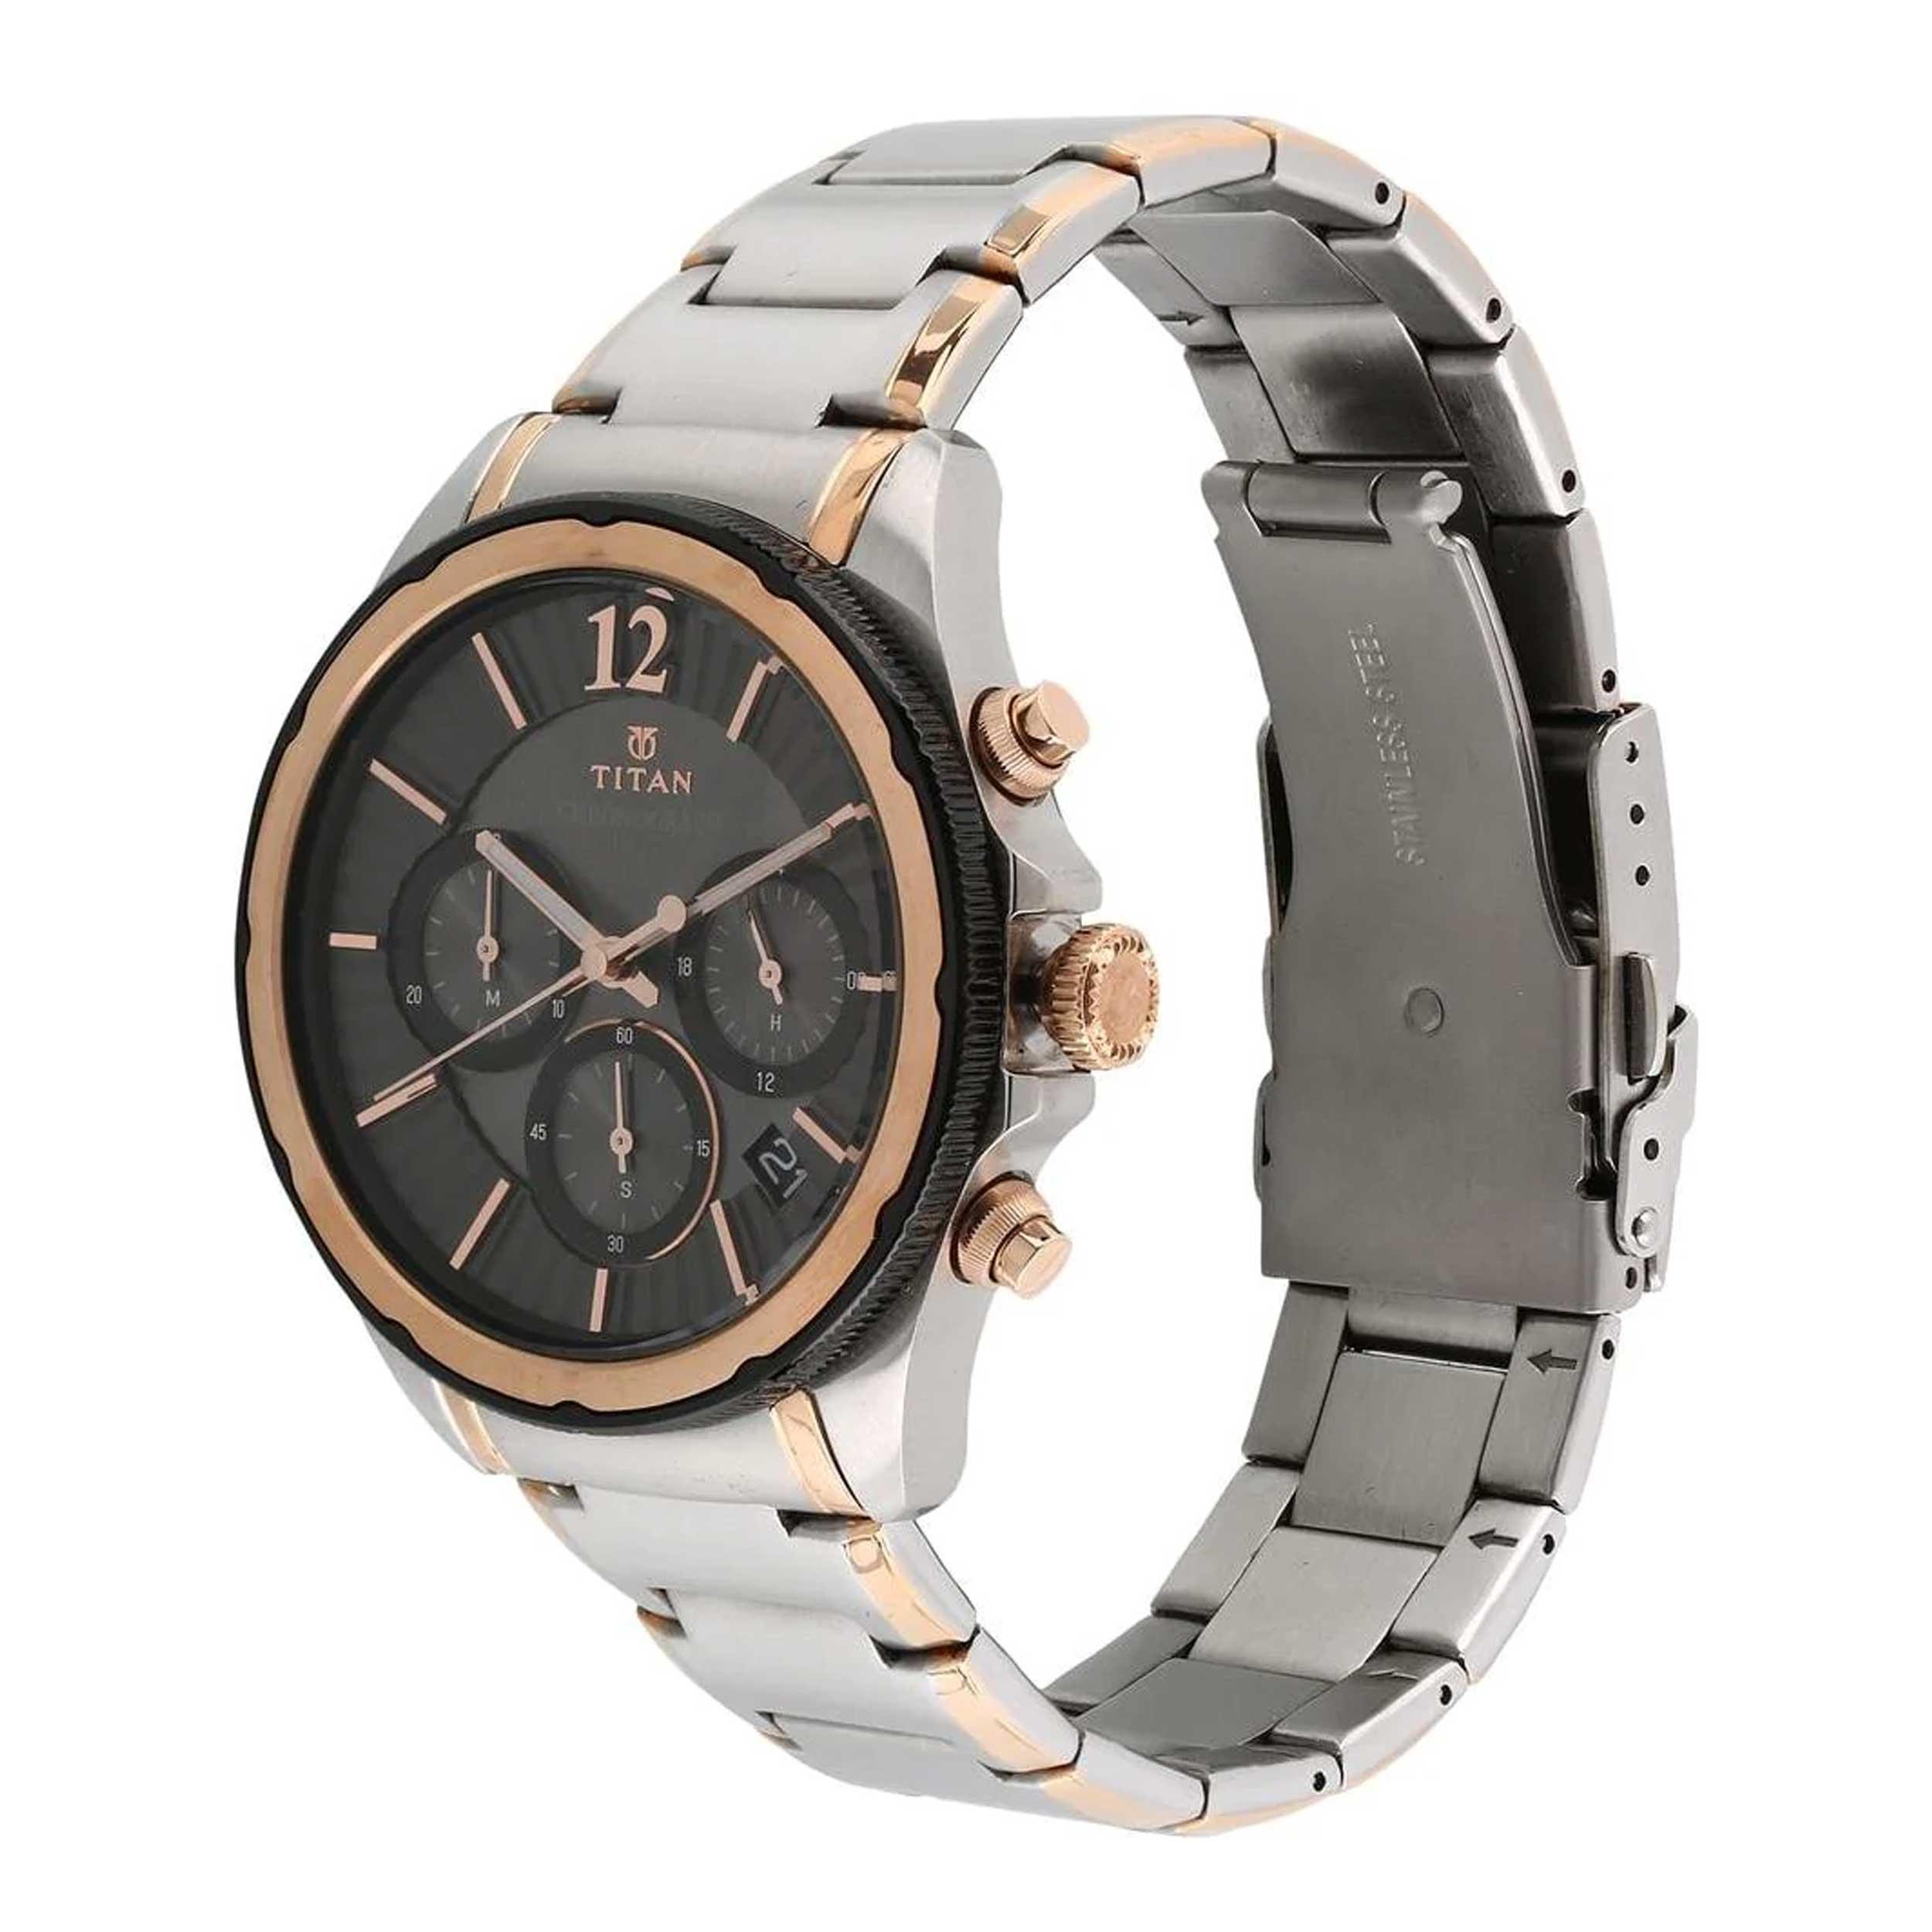 ساعت مچی  مردانه تیتان مدل T1748KM01              اصل